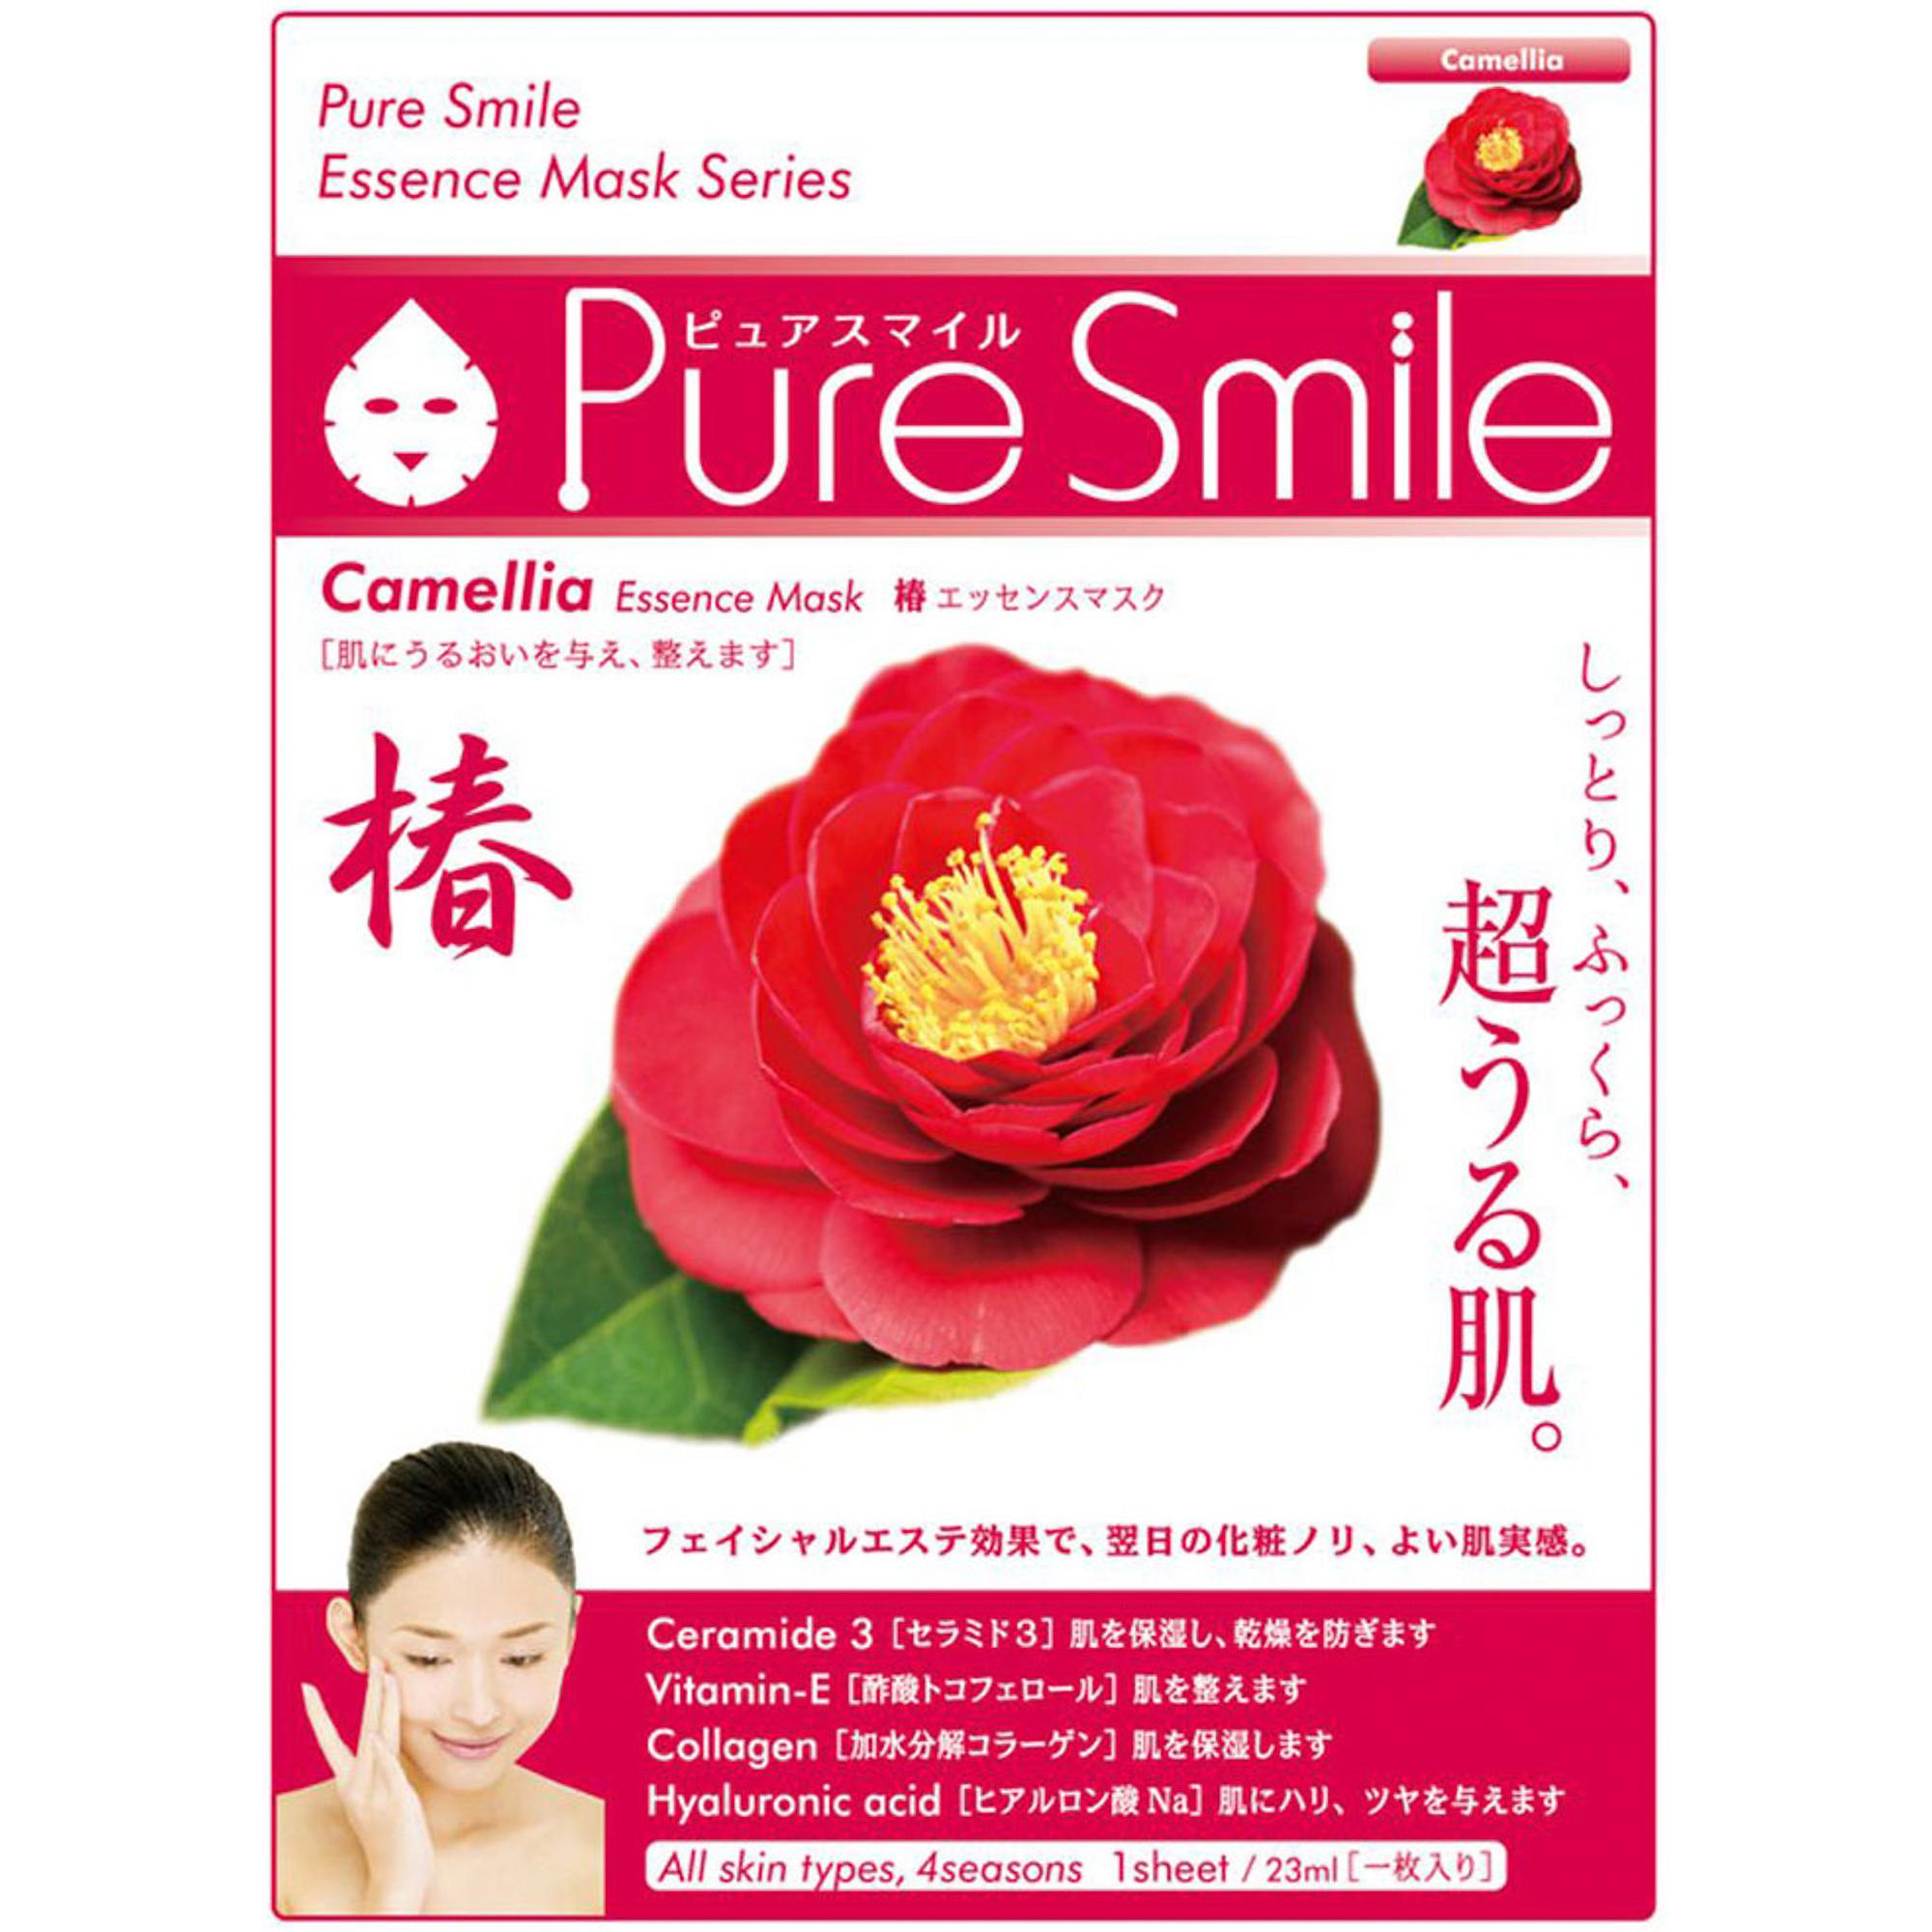 Фото - Маска для лица SunSmile Pure Smile Essence Mask Camellia 23 мл маска для лица sunsmile pure smile essence mask green tea 23 мл